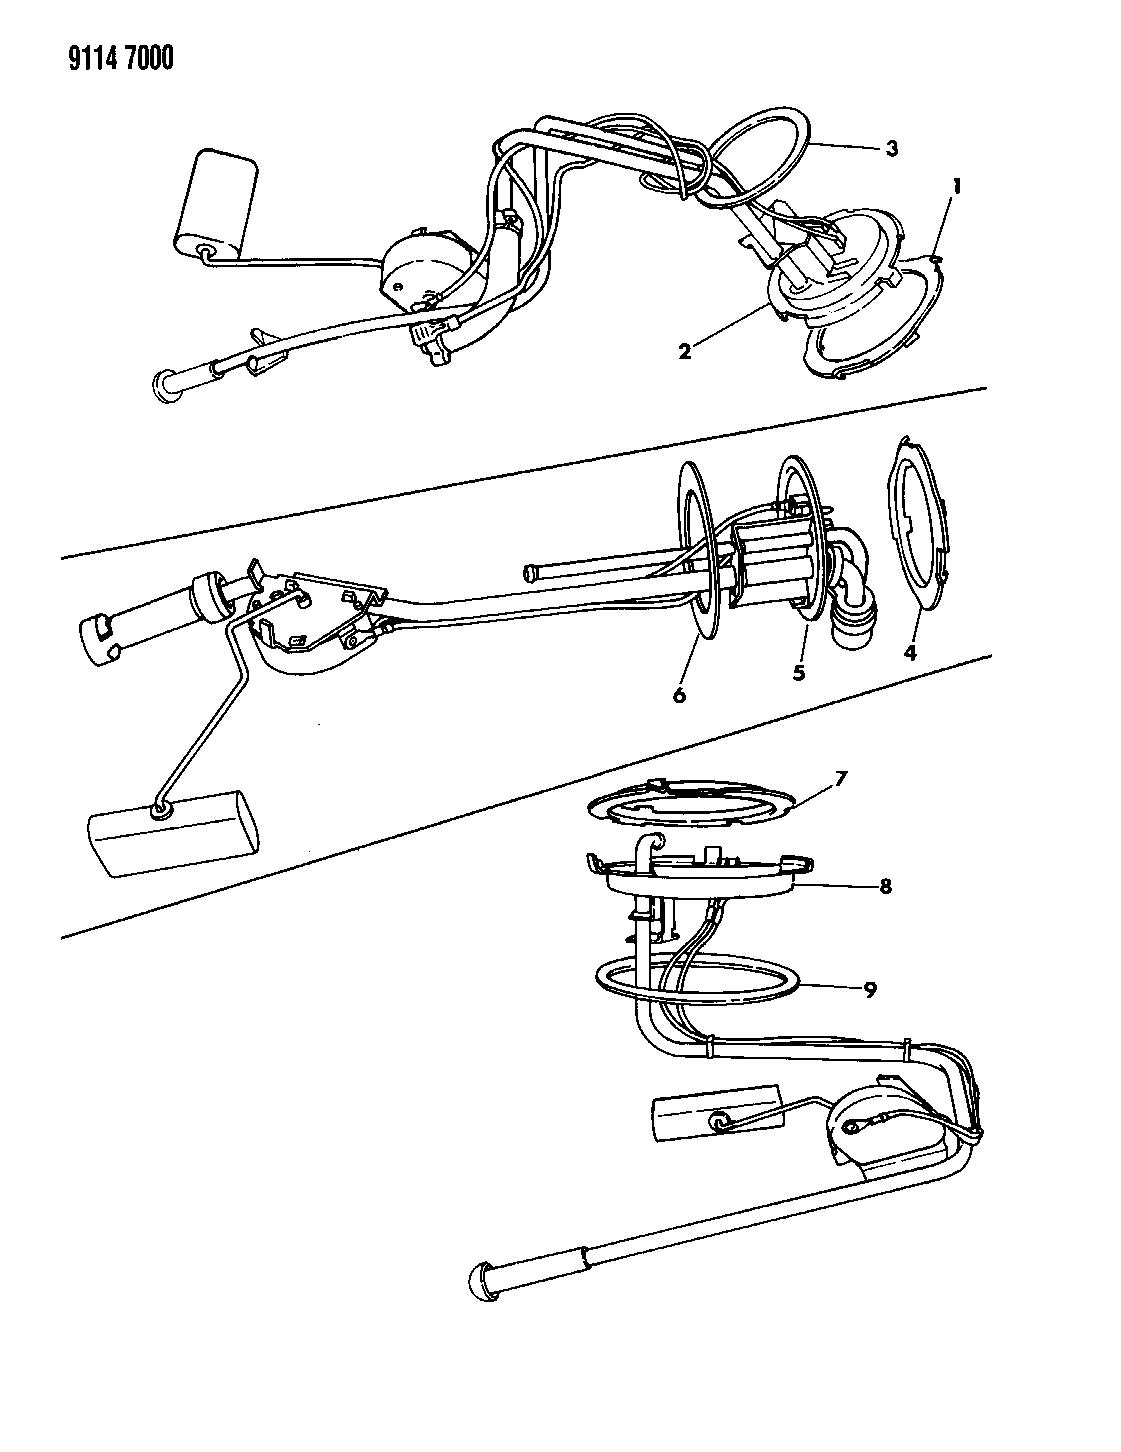 1989 Chrysler LeBaron GTC Fuel Tank Sending Unit